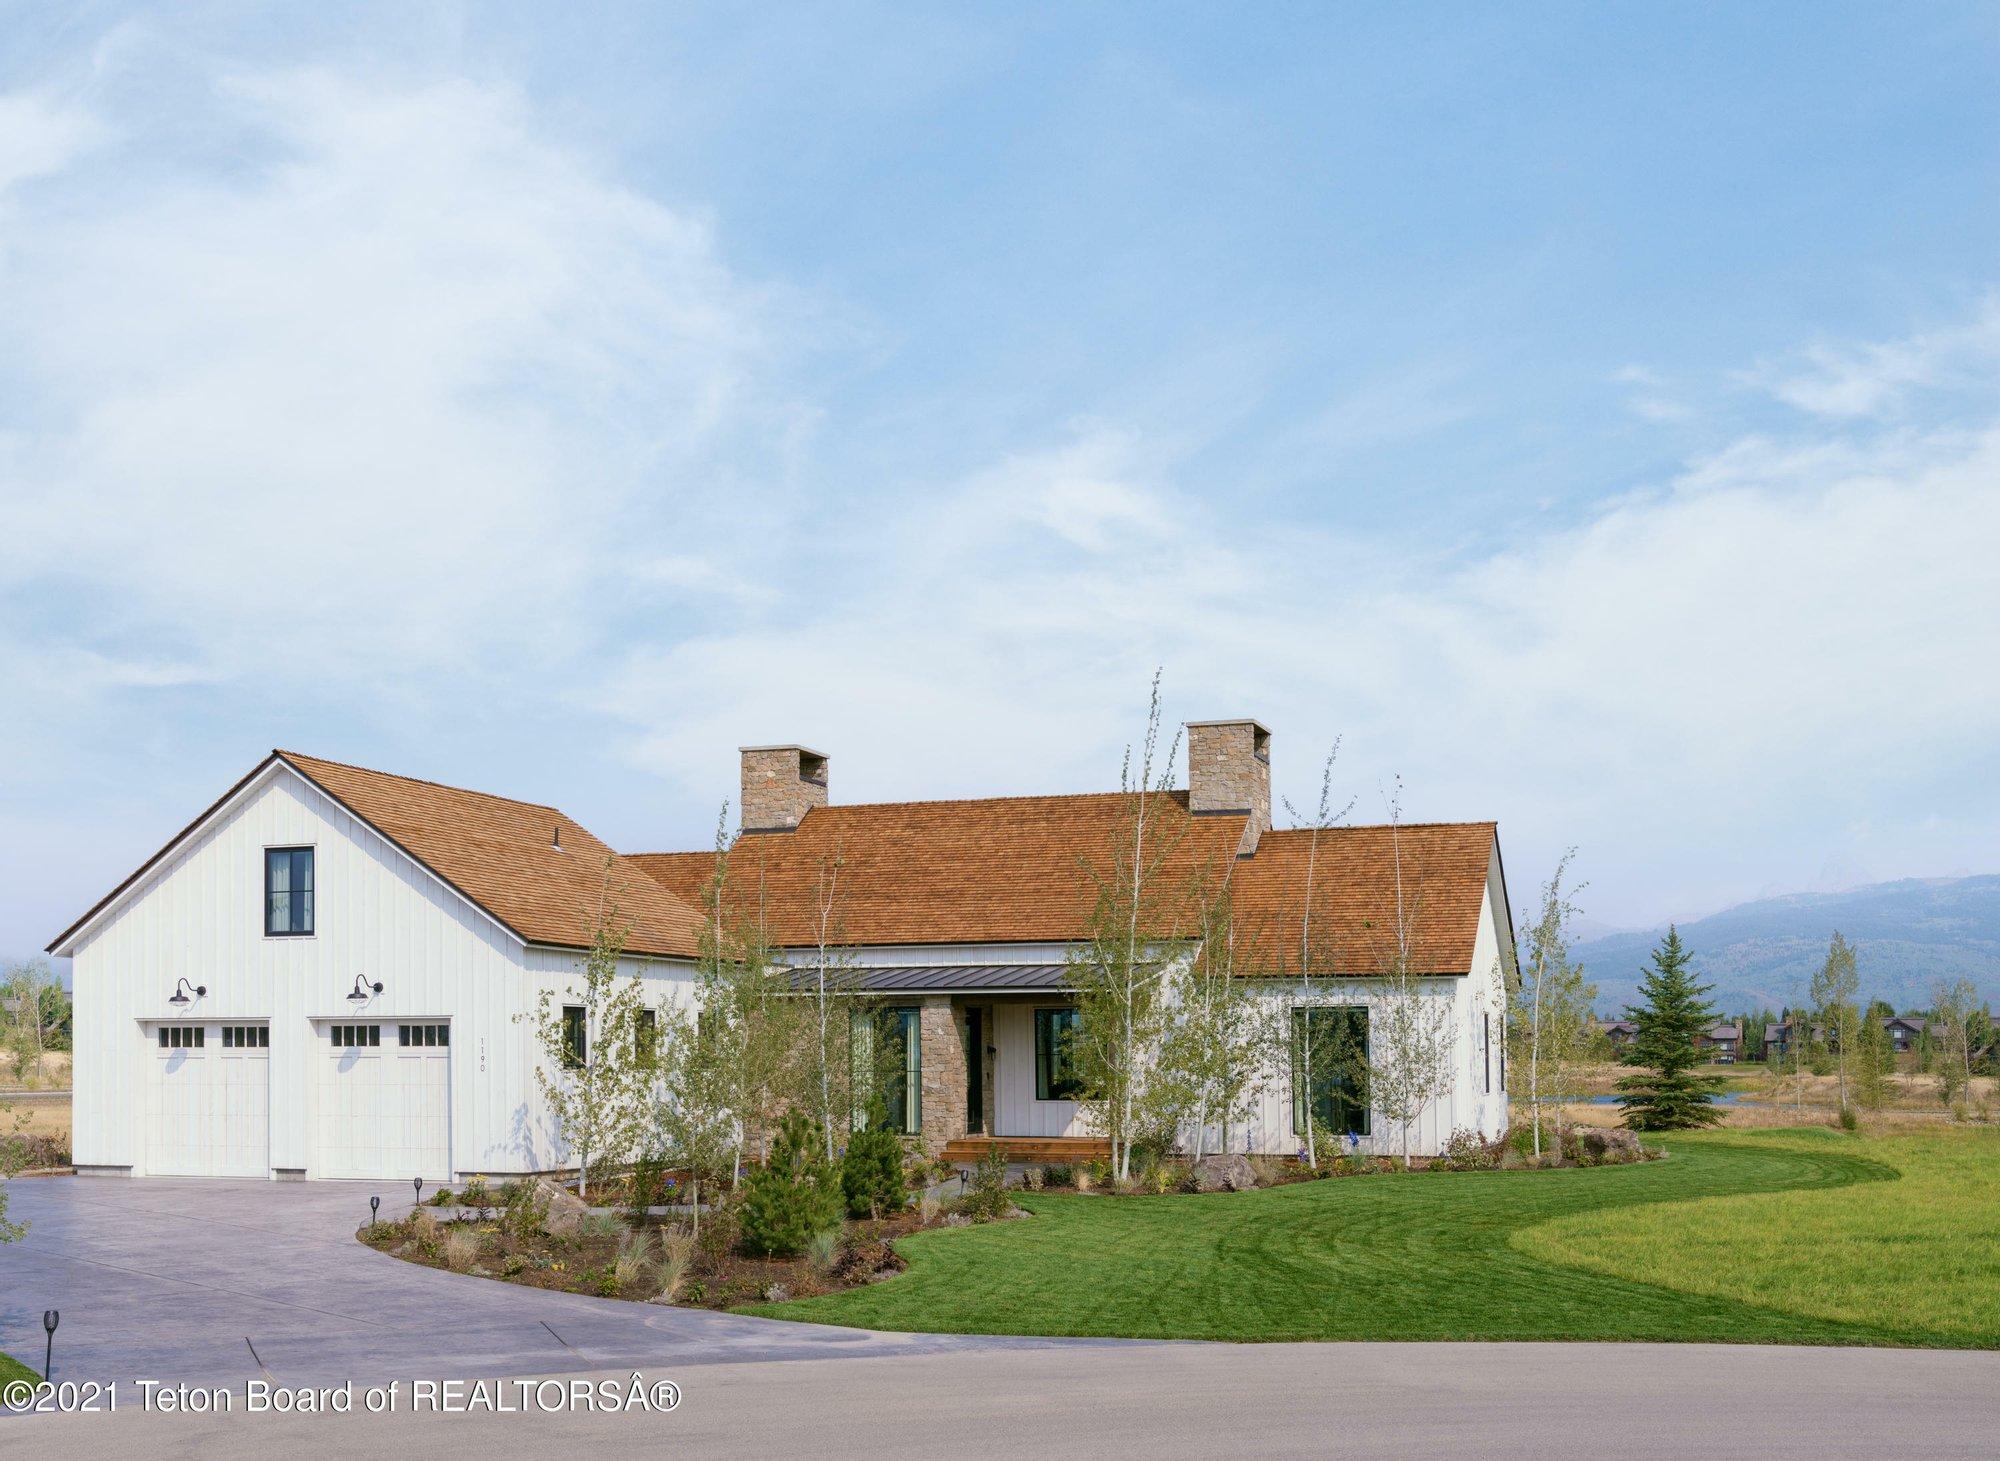 House in Tetonia, Idaho, United States 1